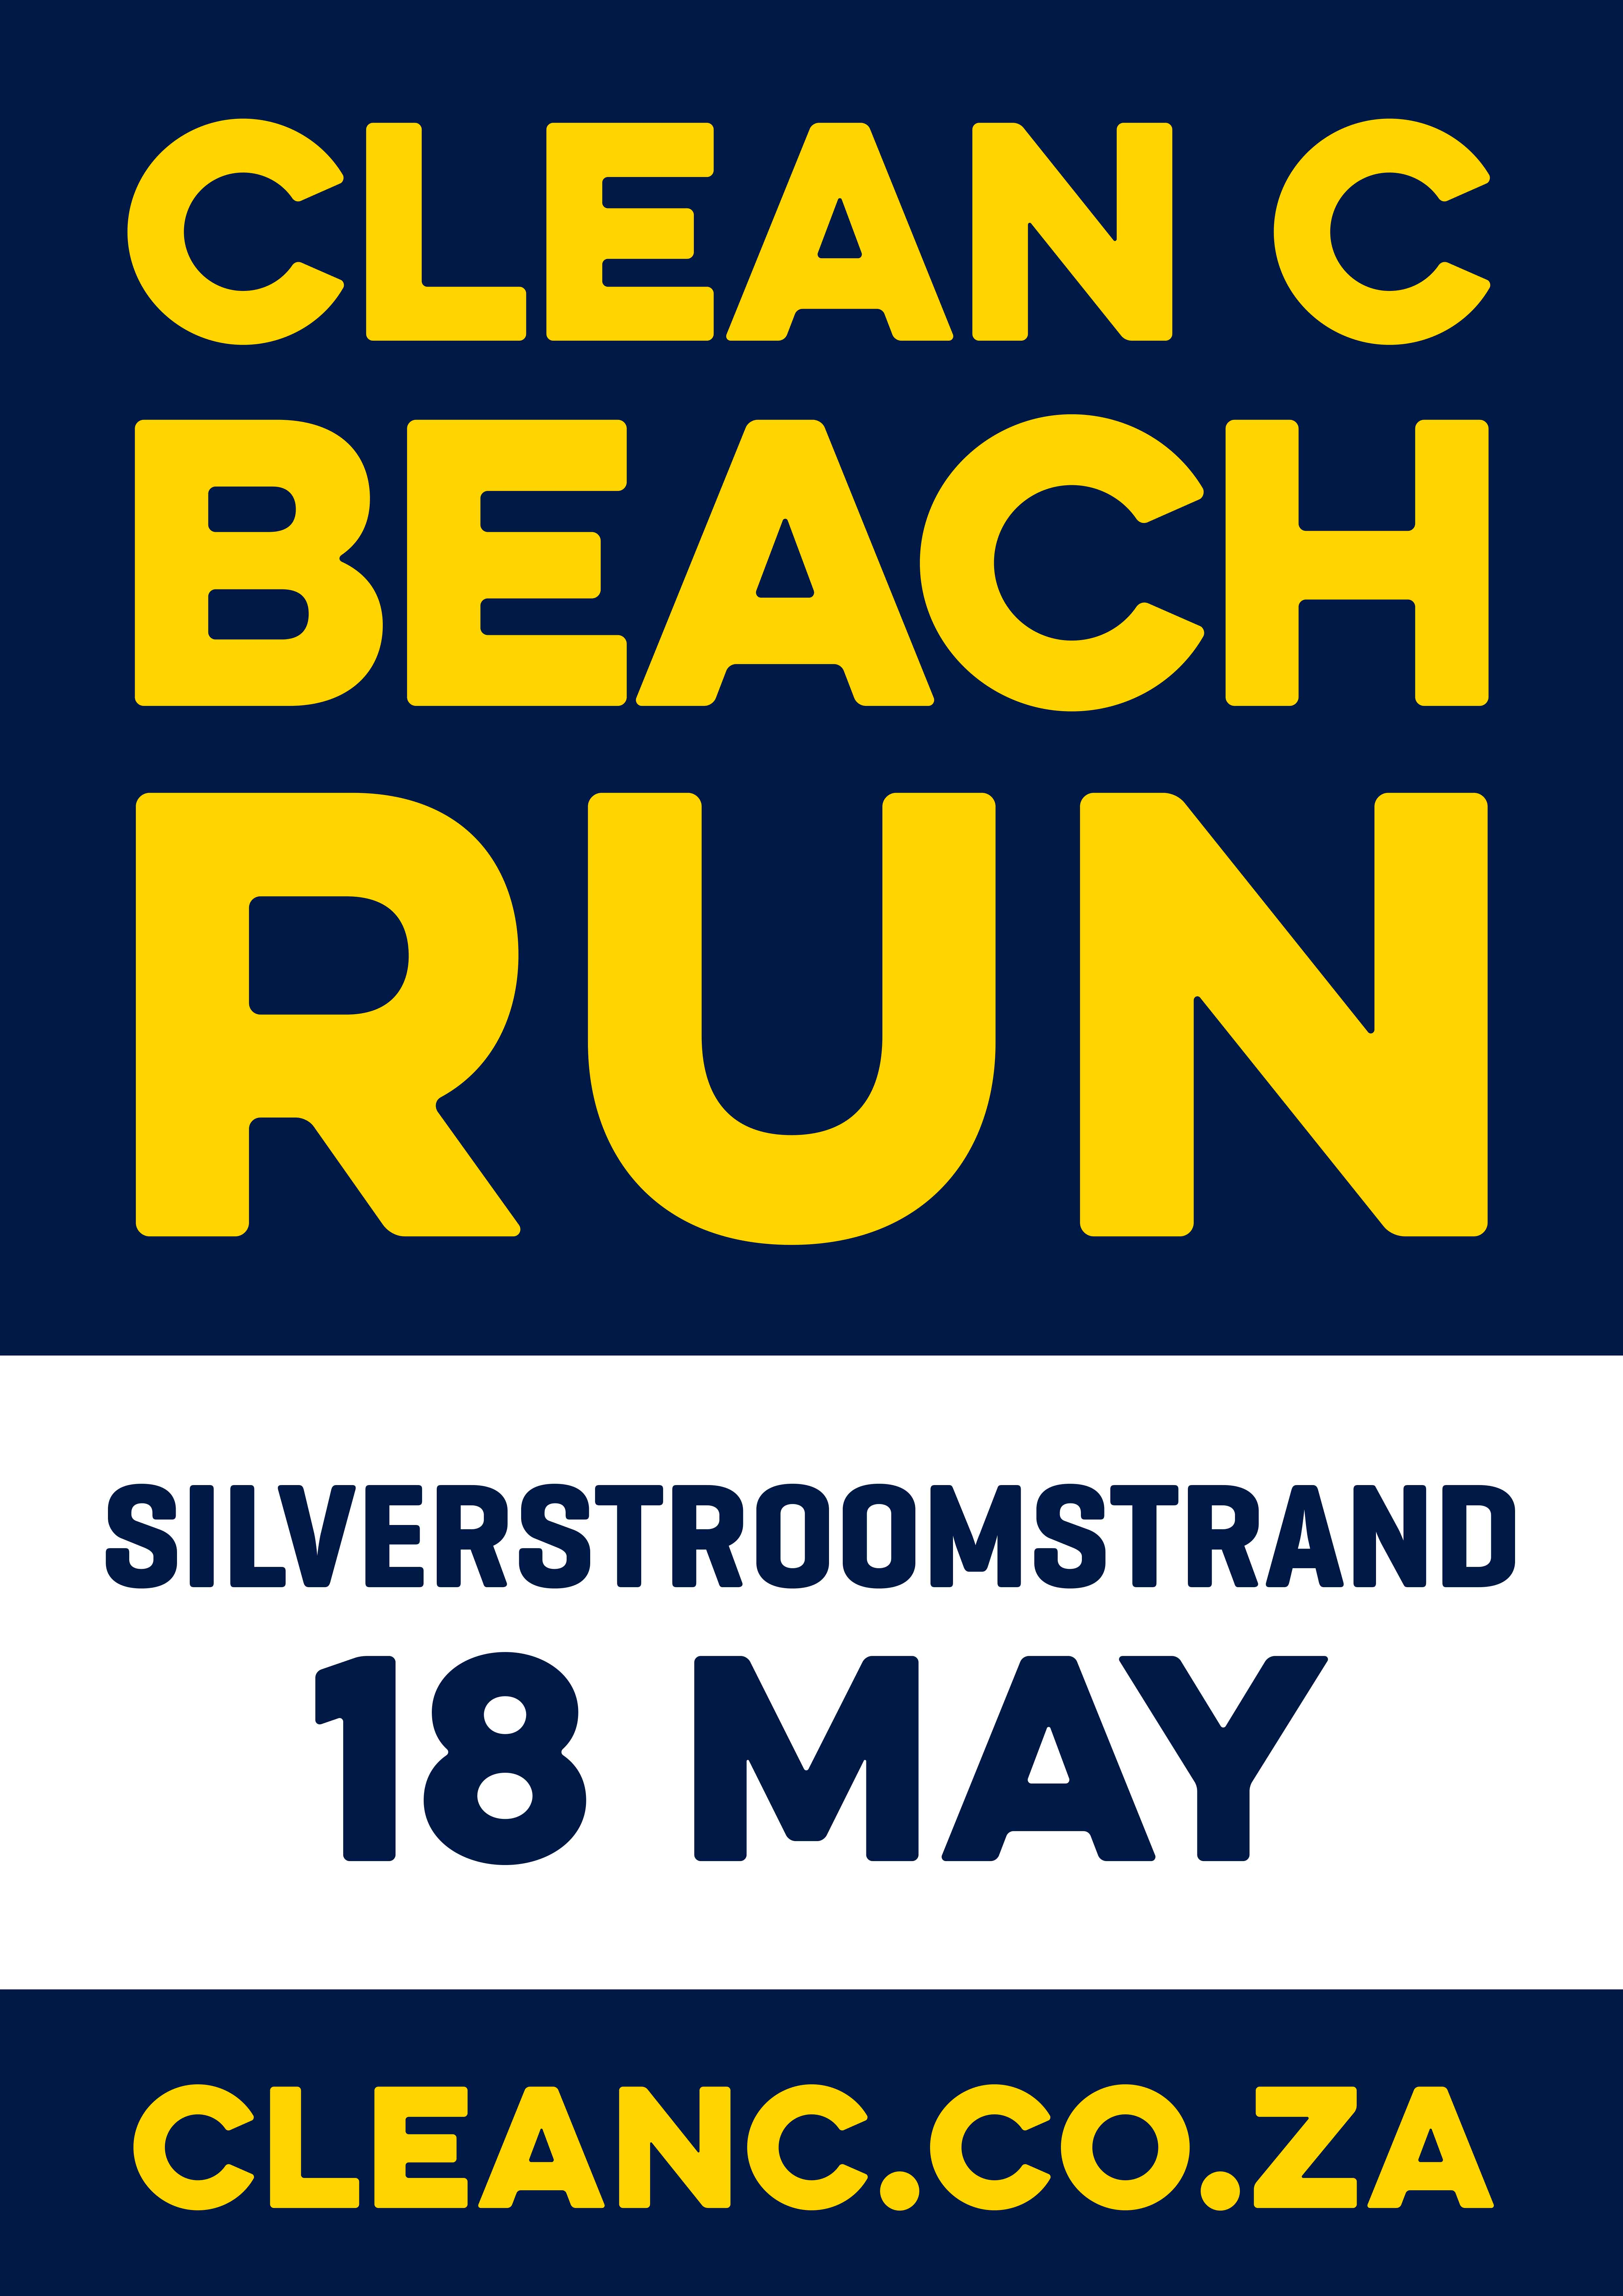 Plastic Free Oceans Beach Run Series - Blue Flag Silverstroomstrand